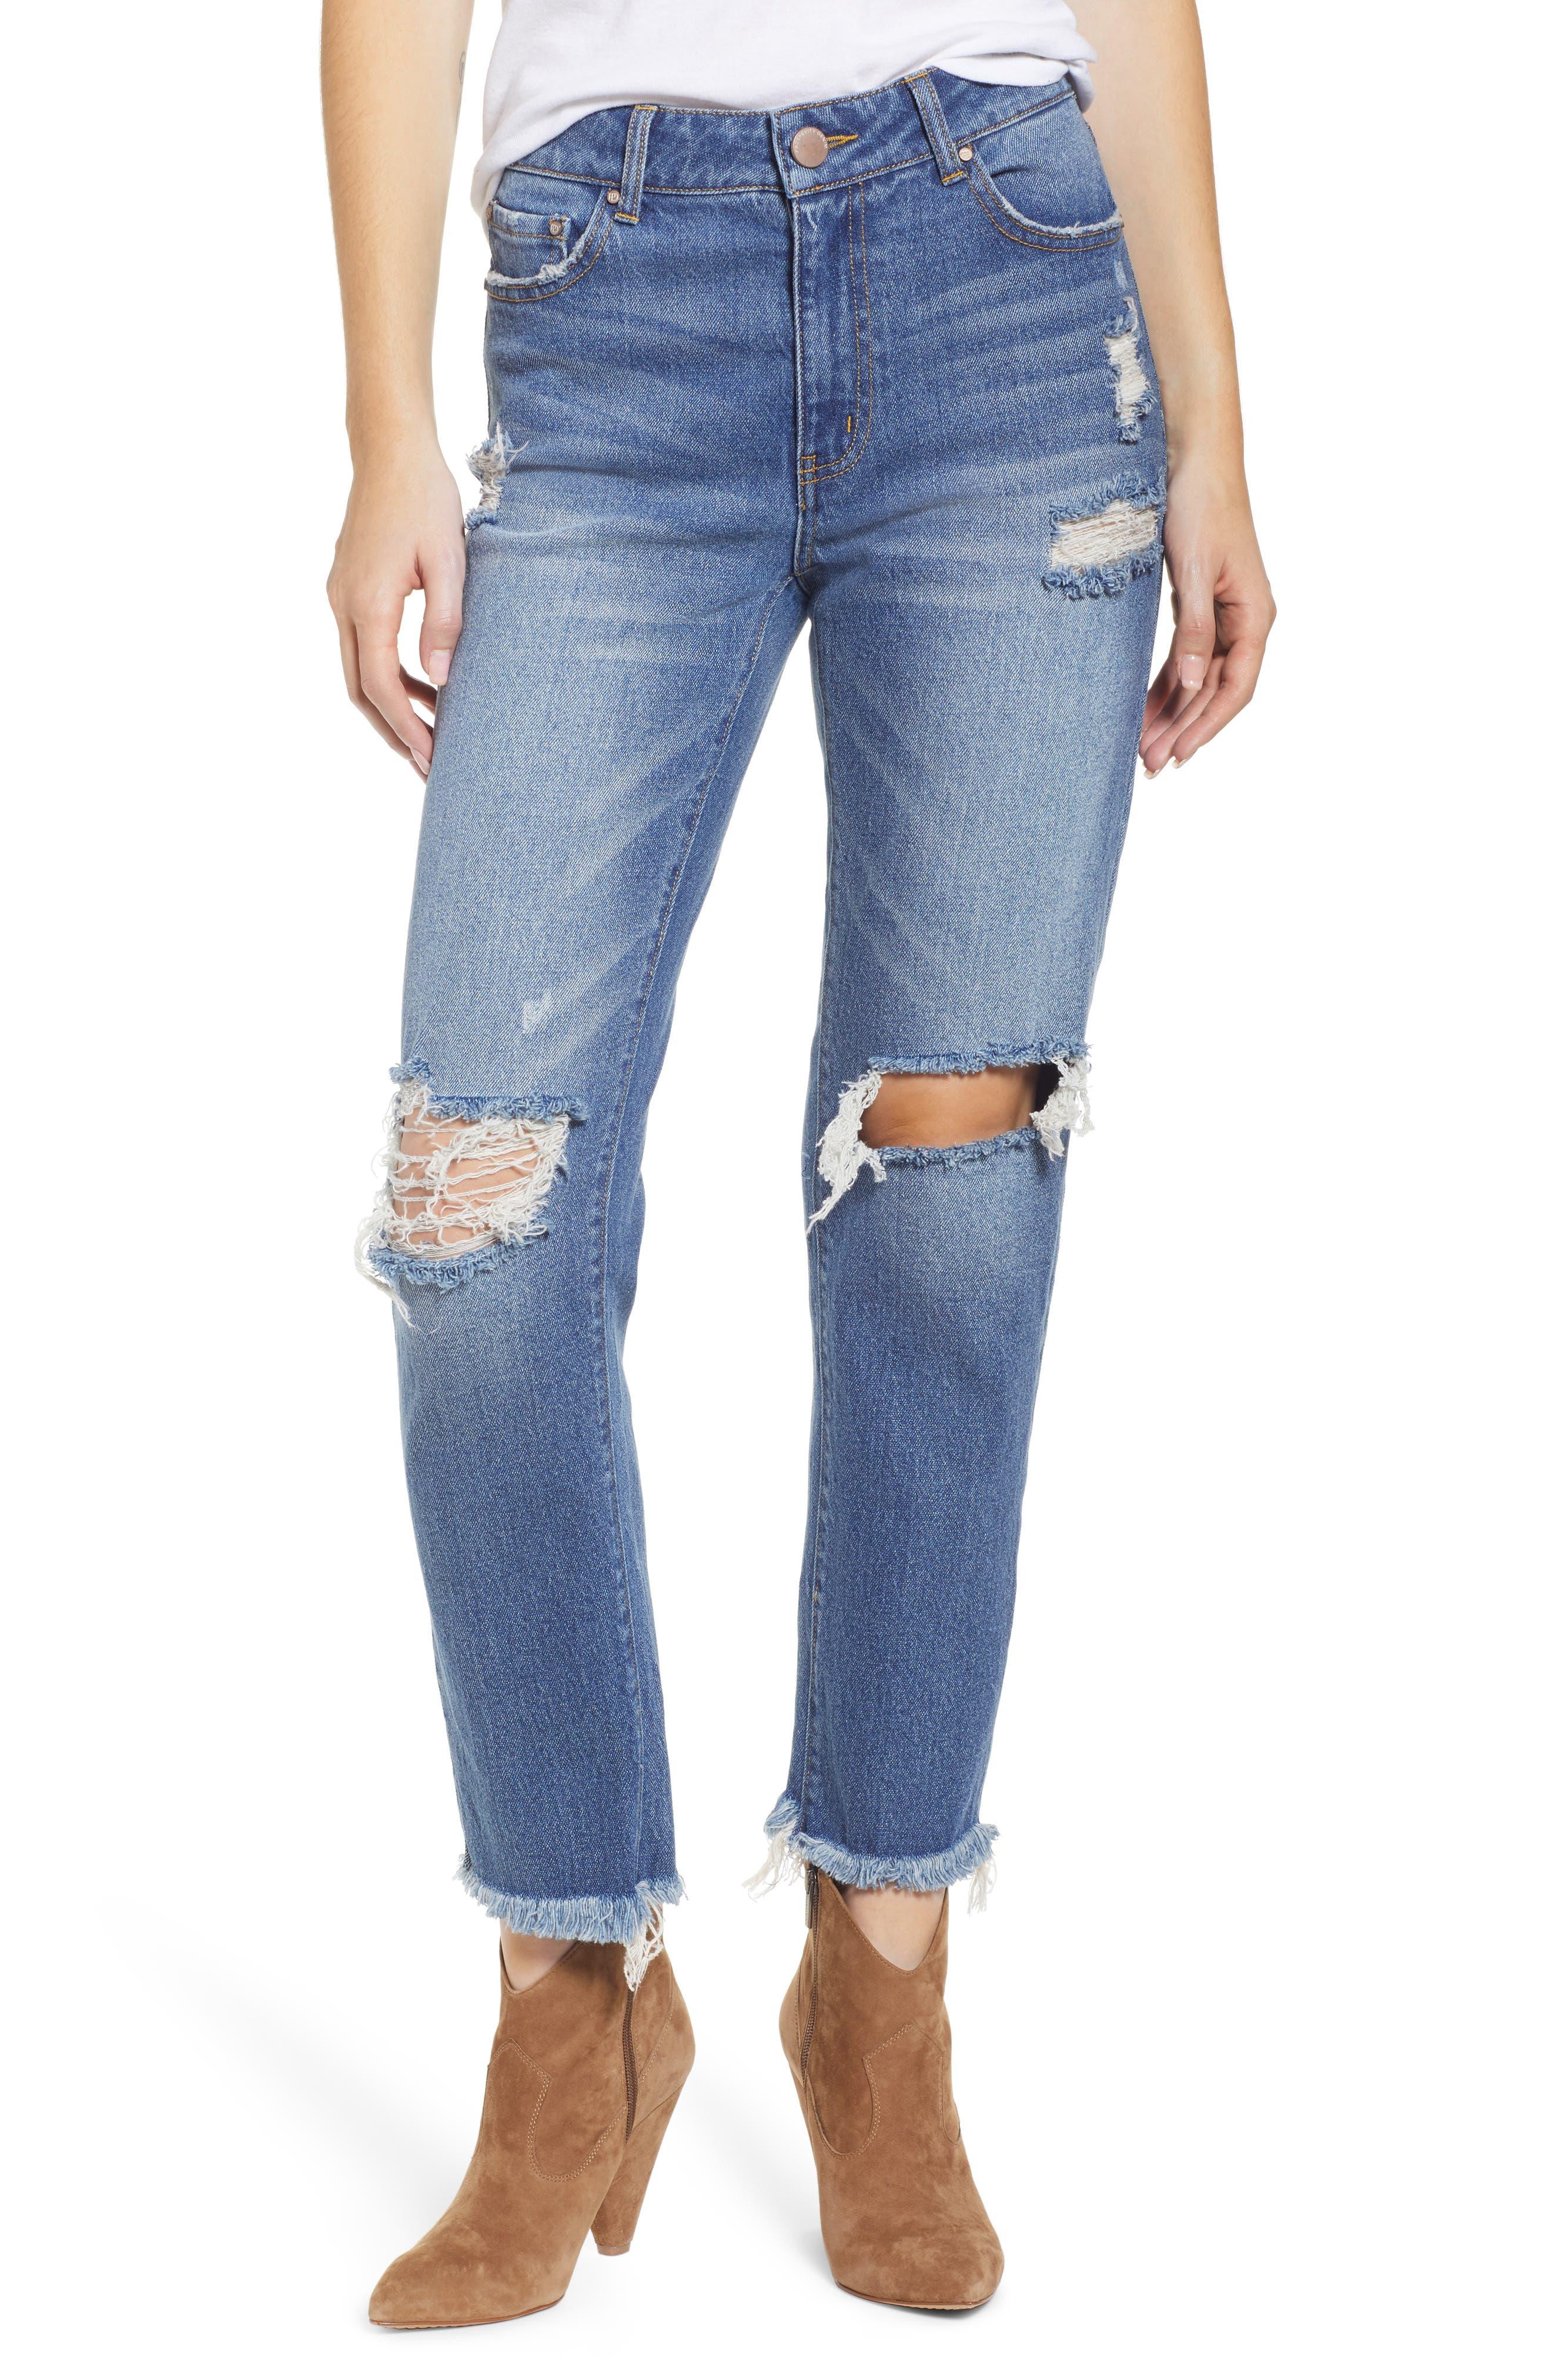 PROSPERITY DENIM, Ripped Ankle Straight Leg Jeans, Main thumbnail 1, color, VINTAGE WASH